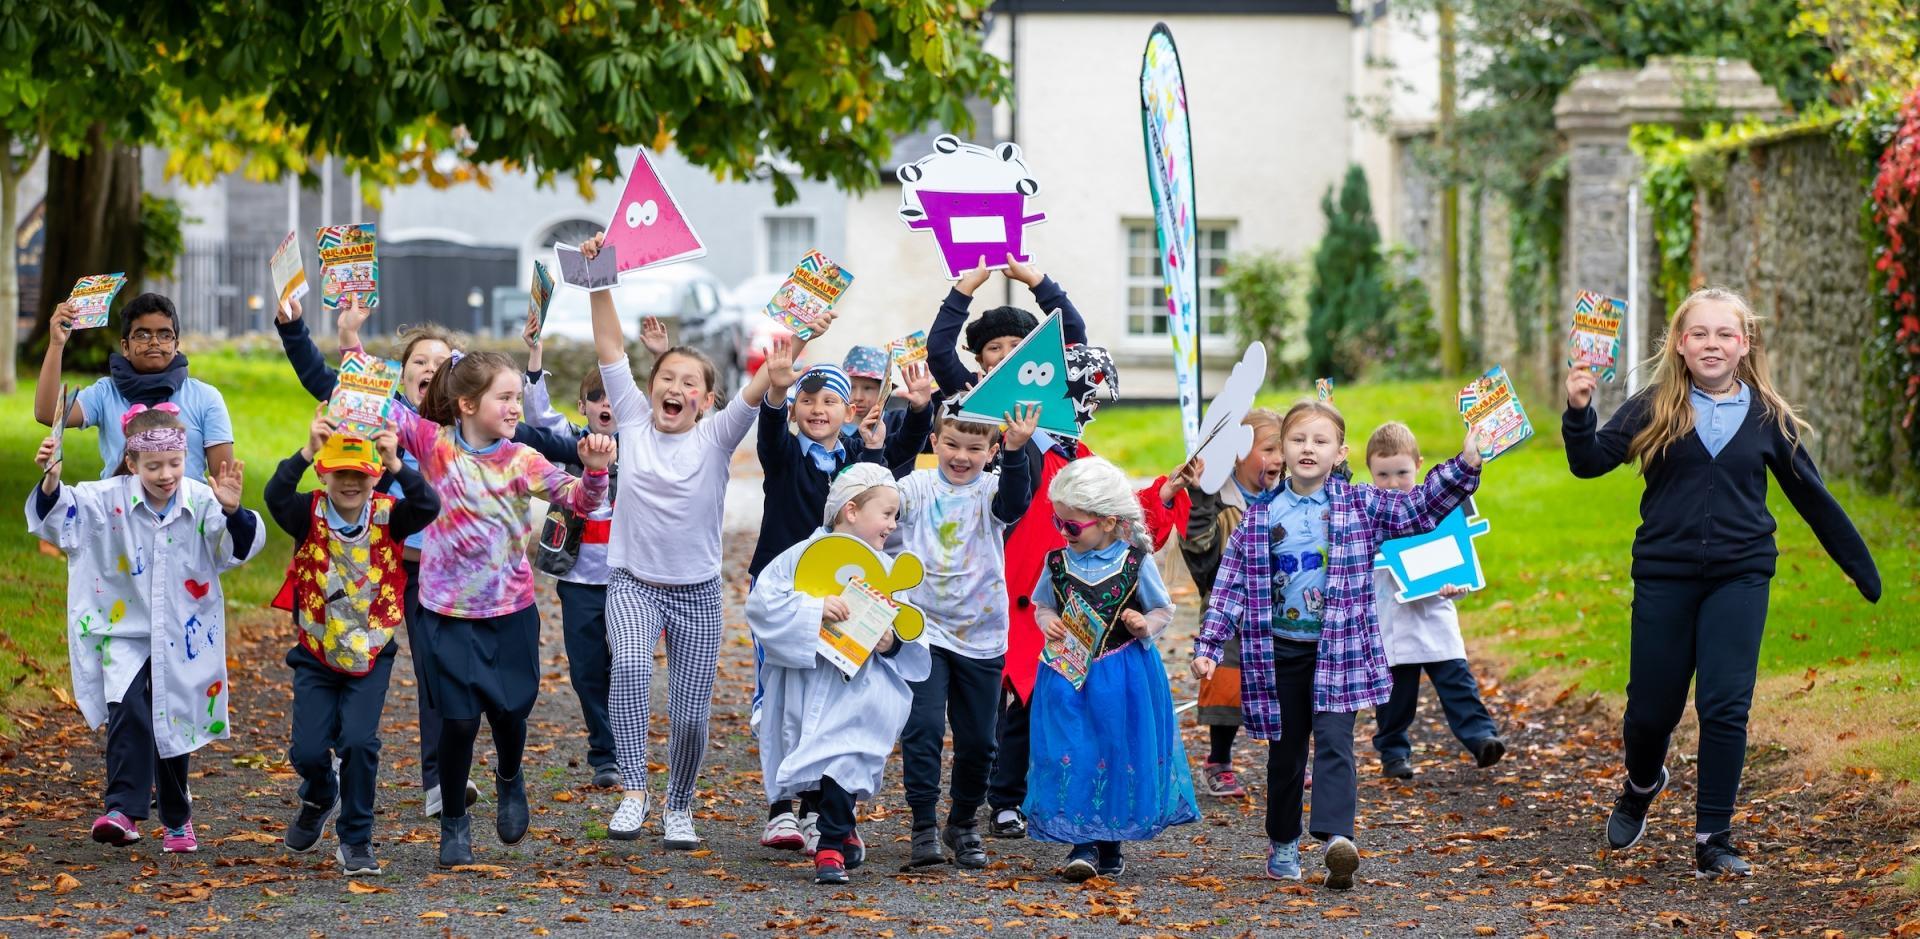 Tullamore, Ireland Charity Events | Eventbrite